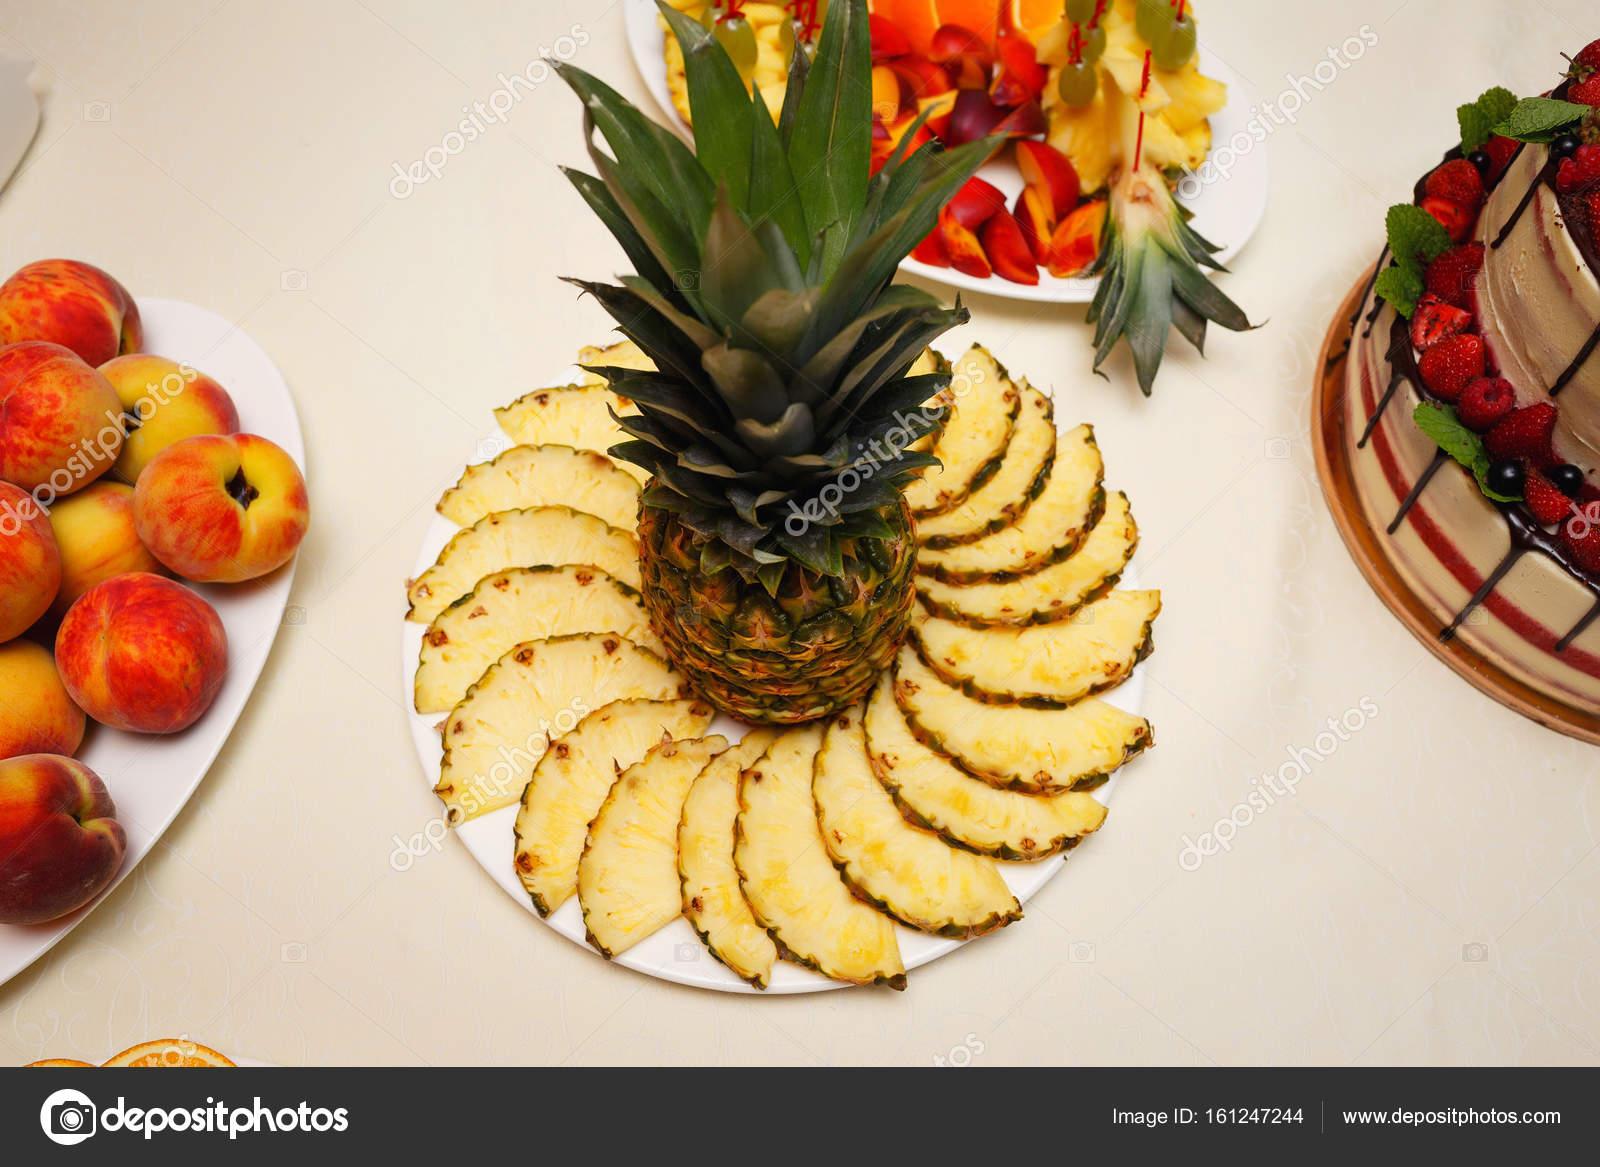 Fotos Frutas Para Fiestas Decoradas Las Placas De Frutas Para La - Decorados-para-fiestas